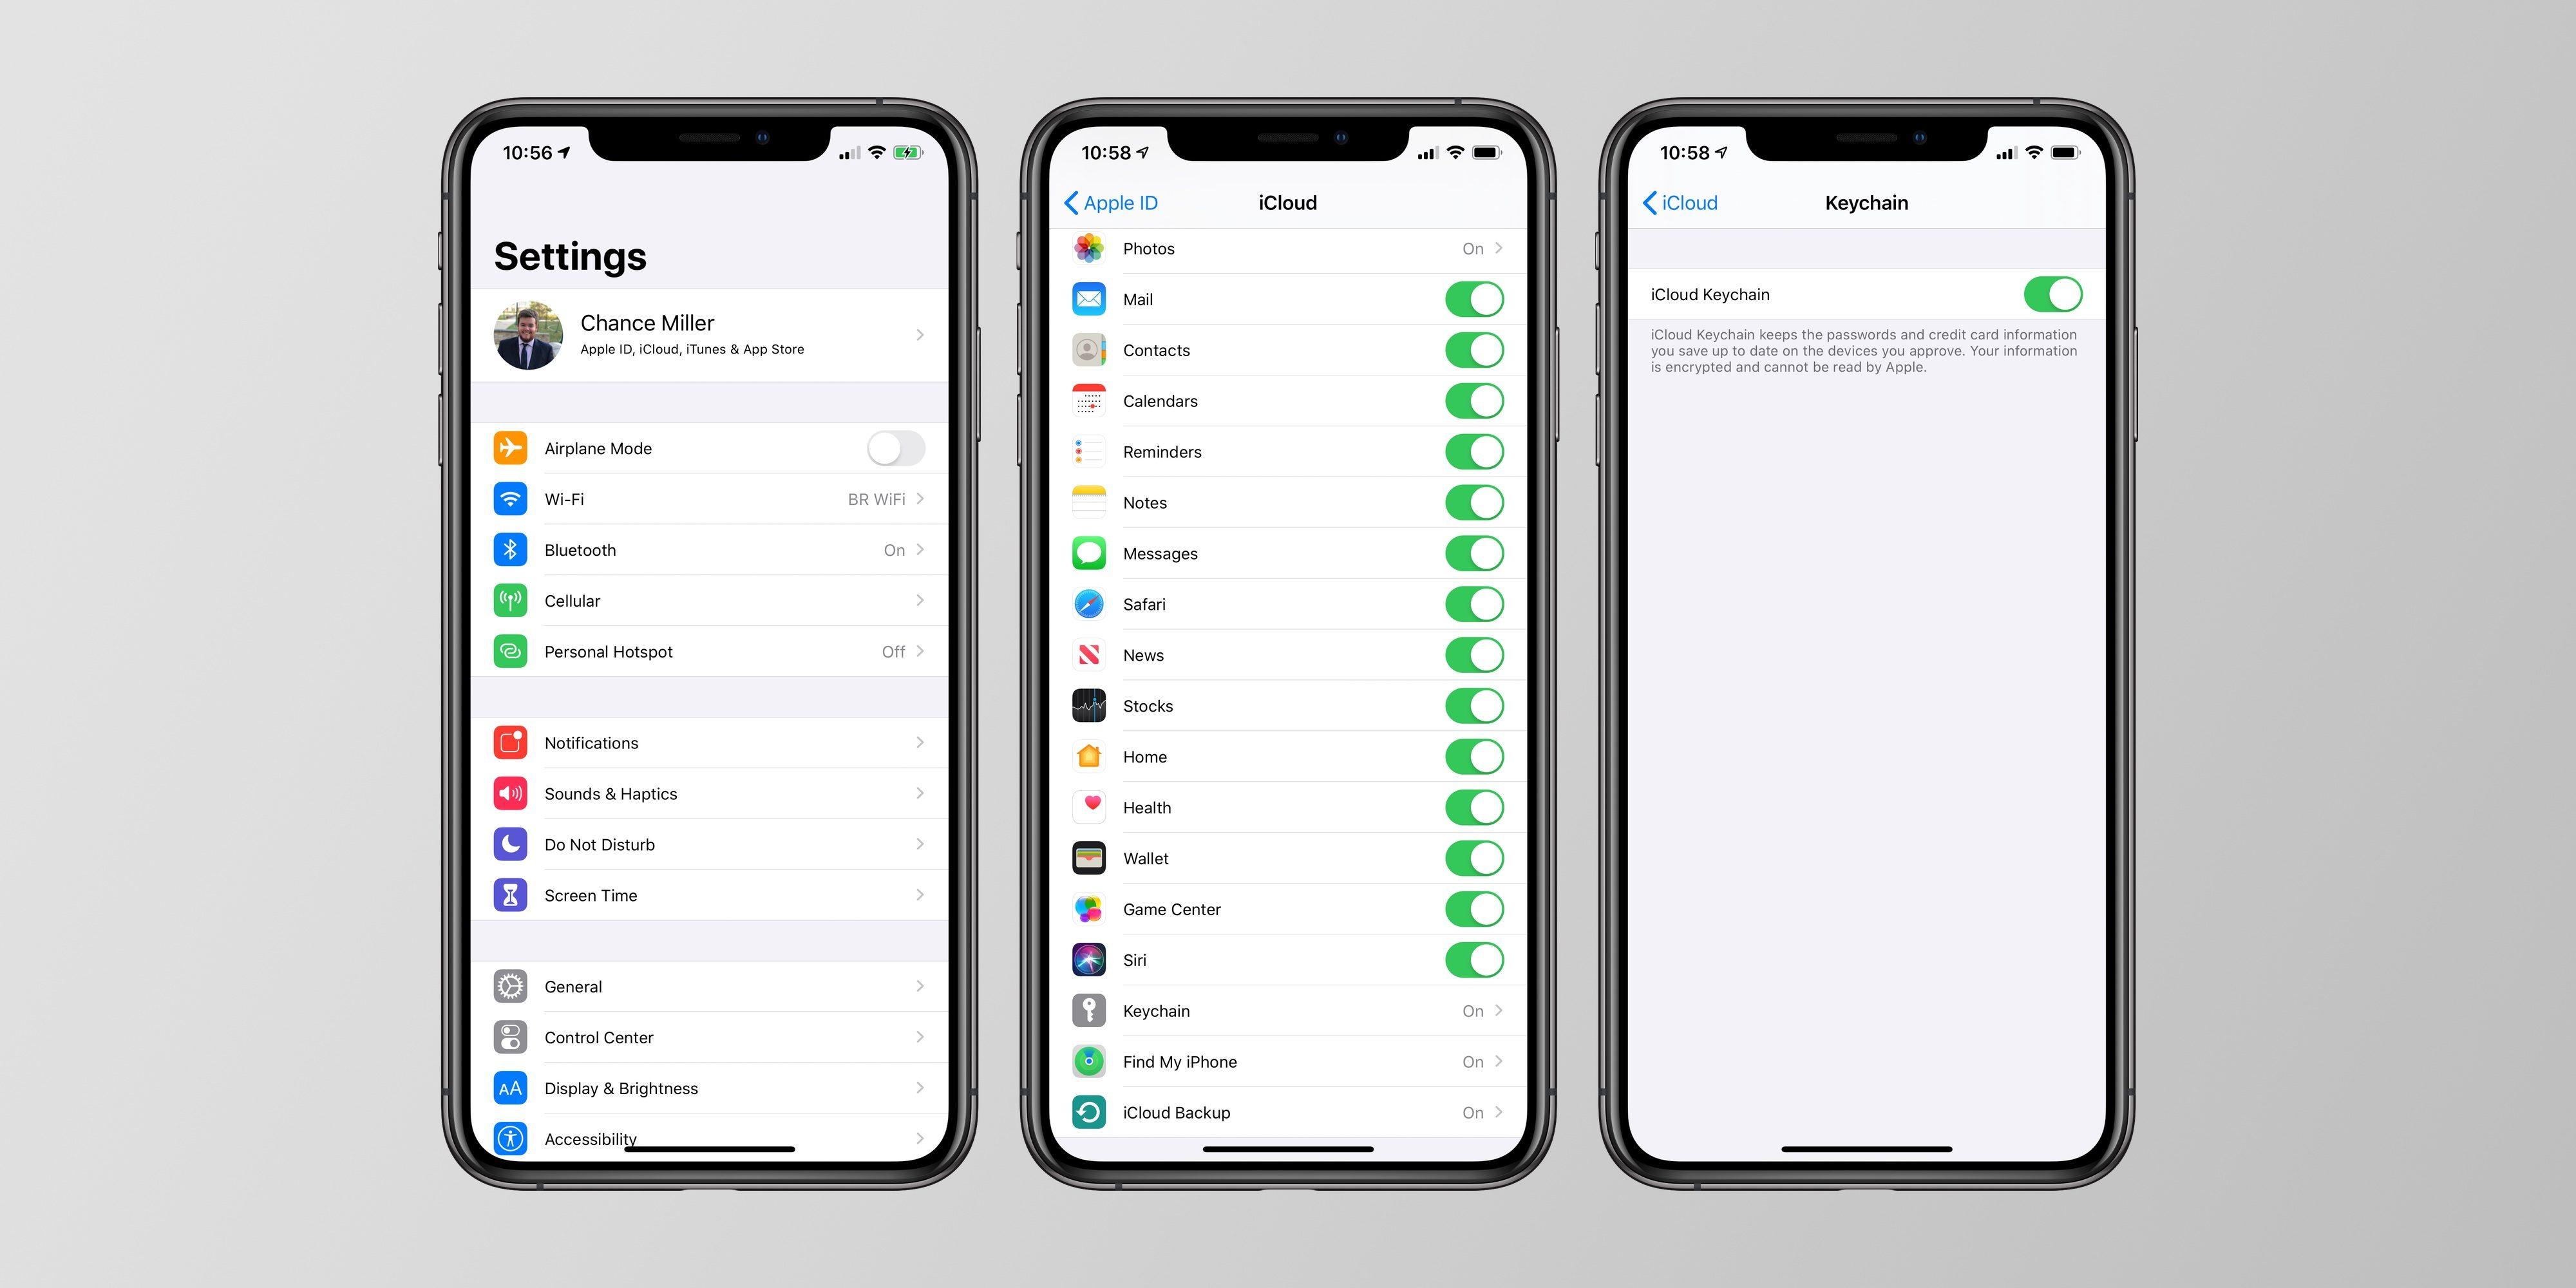 "<span href=""https://9to5mac.com/2019/09/29/how-to-use-icloud-keychain-passwords/"">Cómo usar iCloud Keychain para administrar y almacenar sus contraseñas</a>"